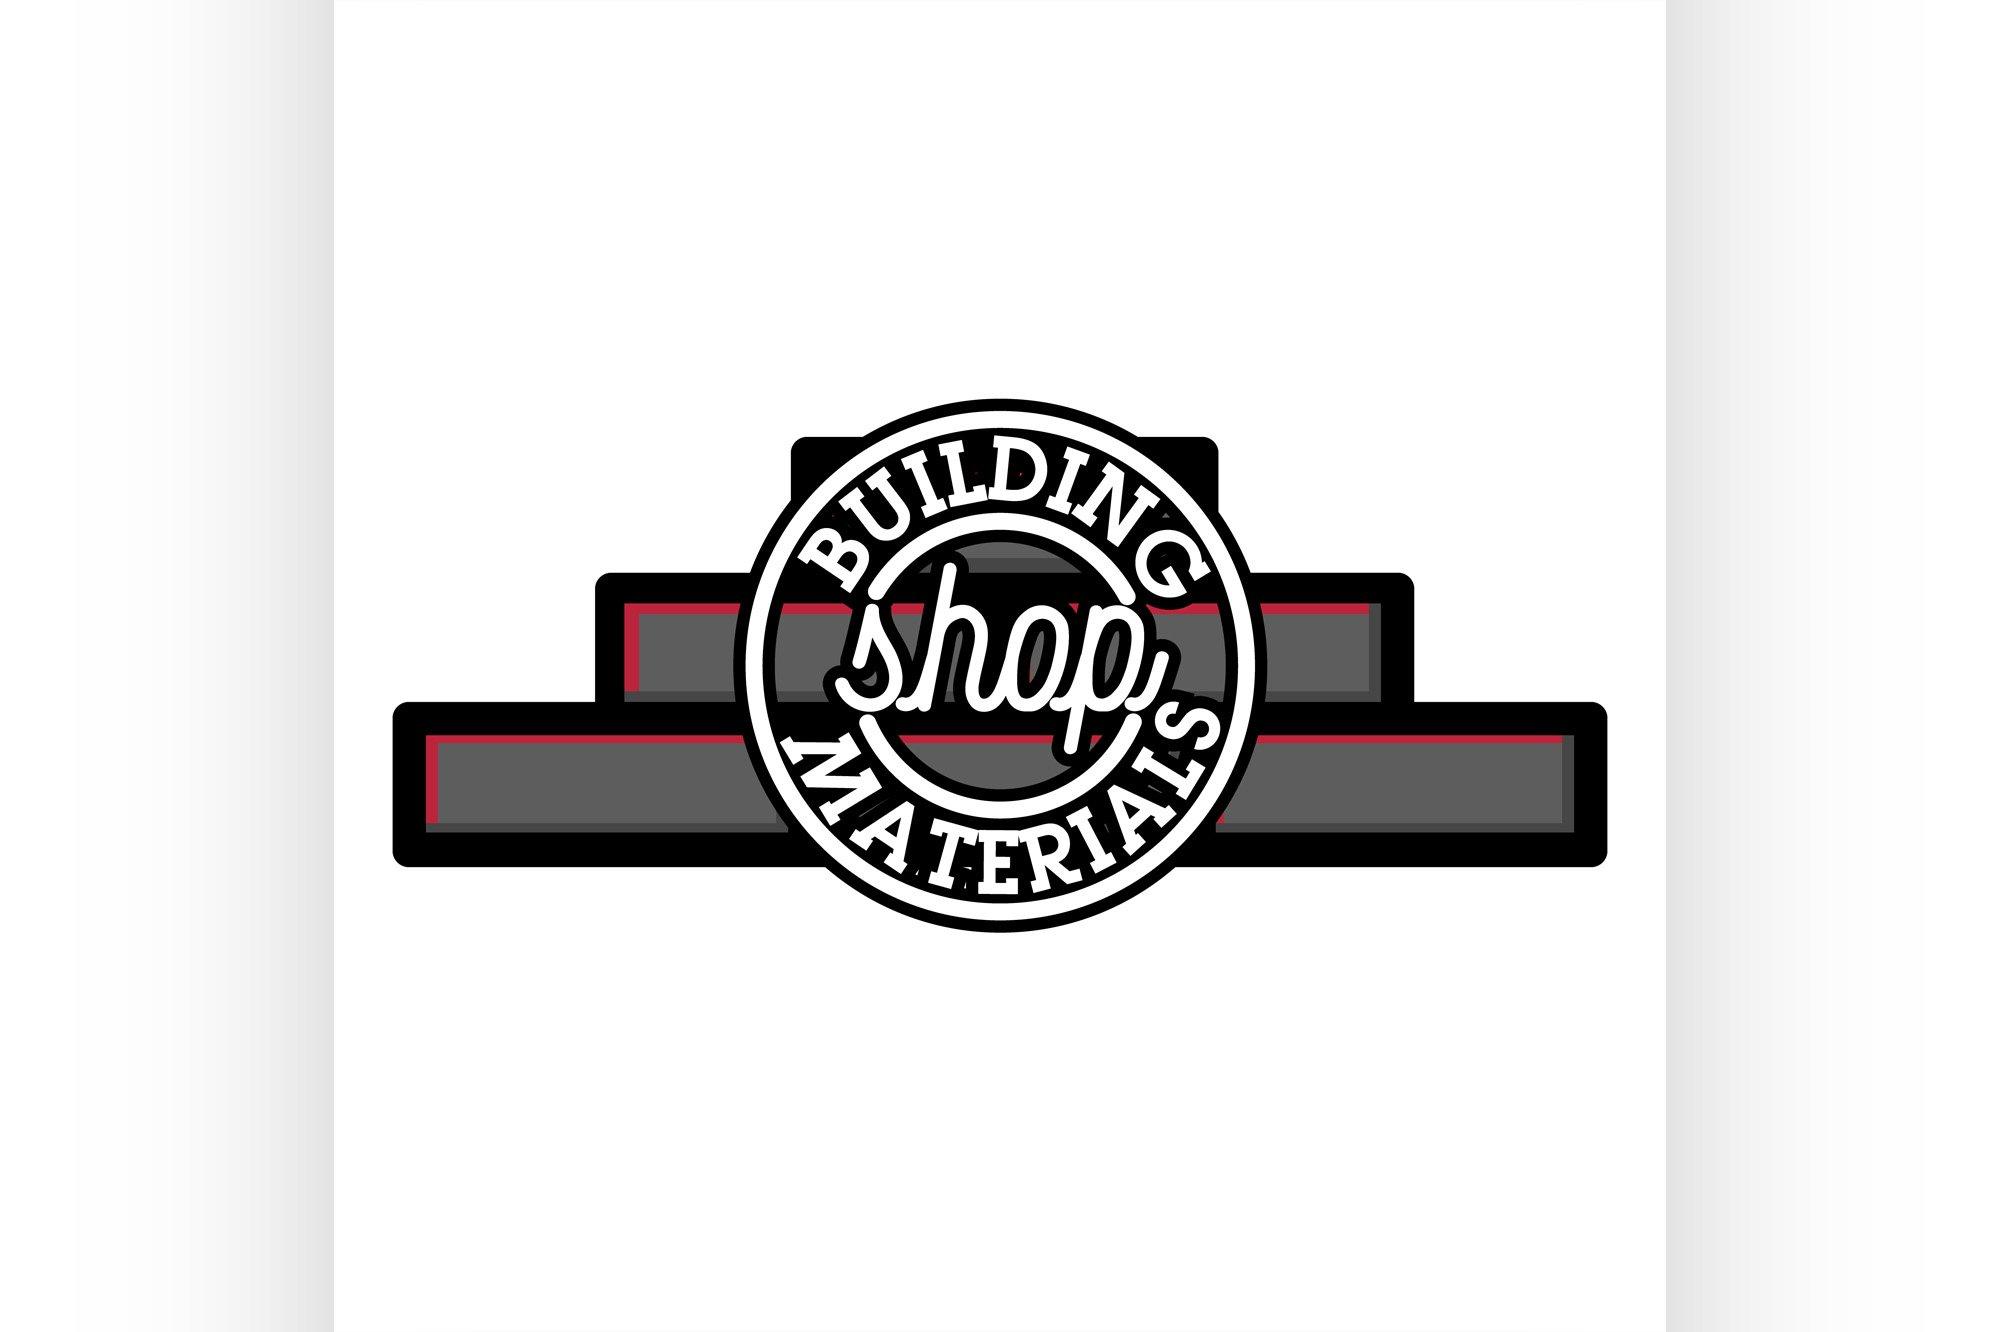 Color vintage building materials shop emblem example image 1